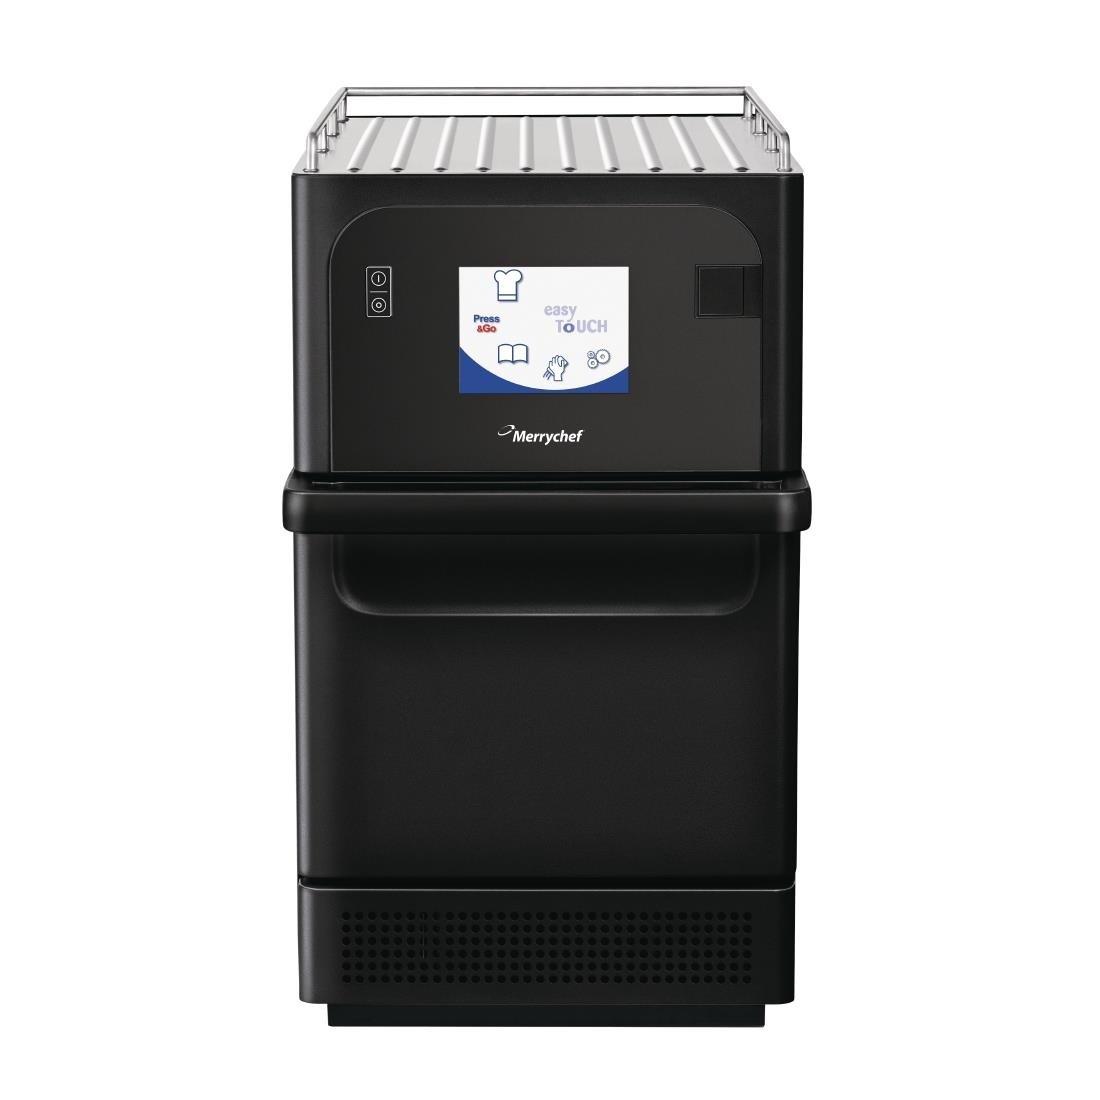 Poser Four Sur Micro Onde four eikon® e2s - easytouch® - air surpressé + micro-ondes merrychef